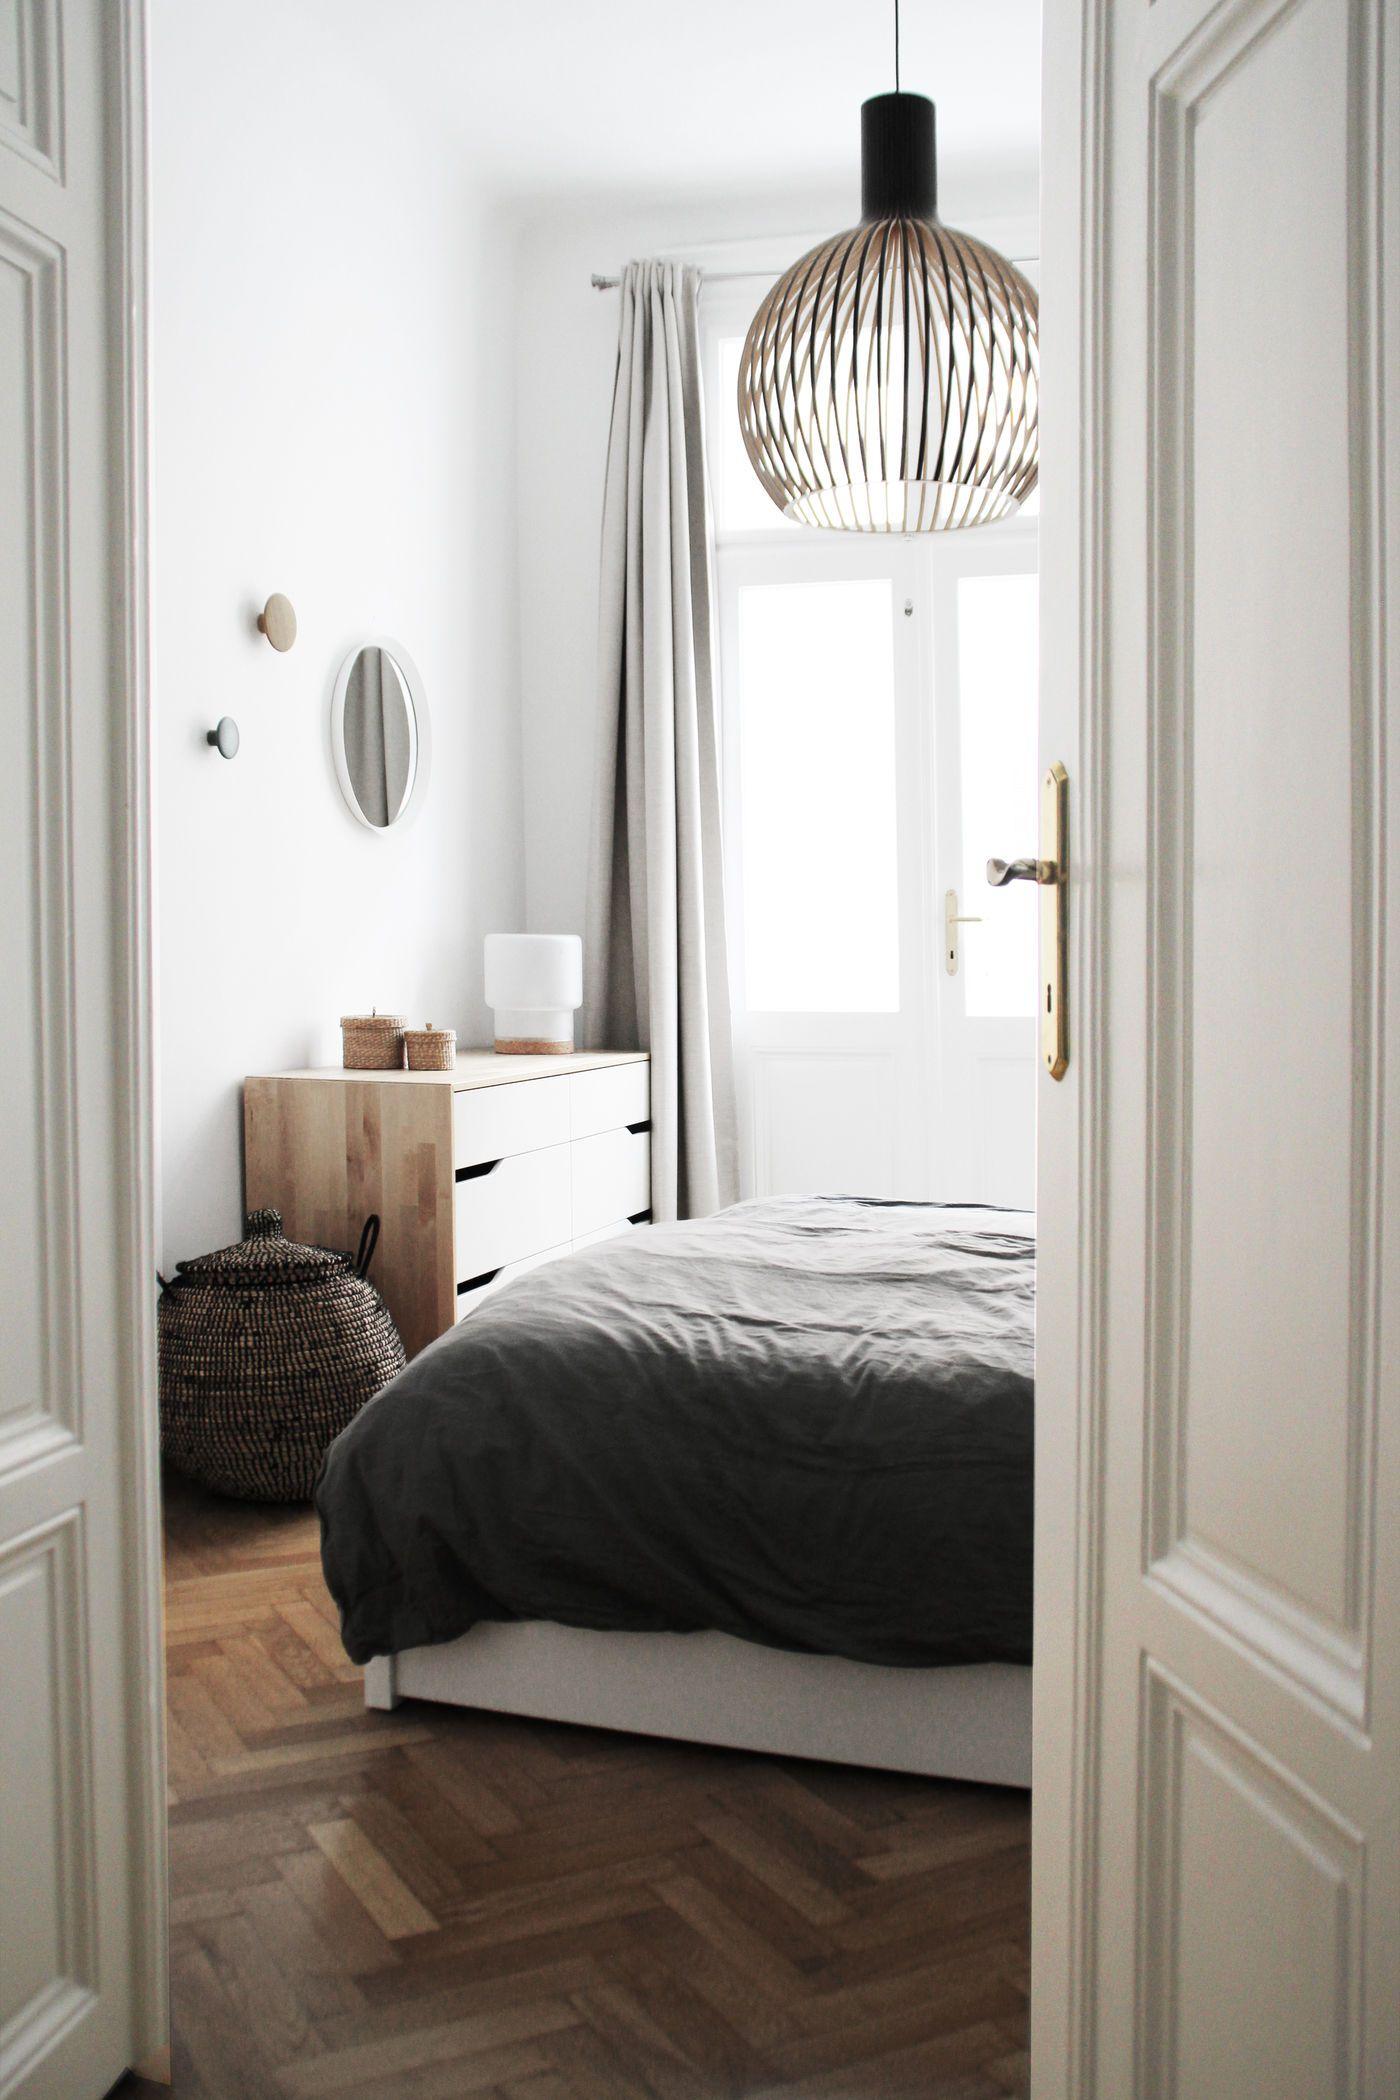 design stuhl schlafzimmer ikea schlafzimmer 2018 deko. Black Bedroom Furniture Sets. Home Design Ideas